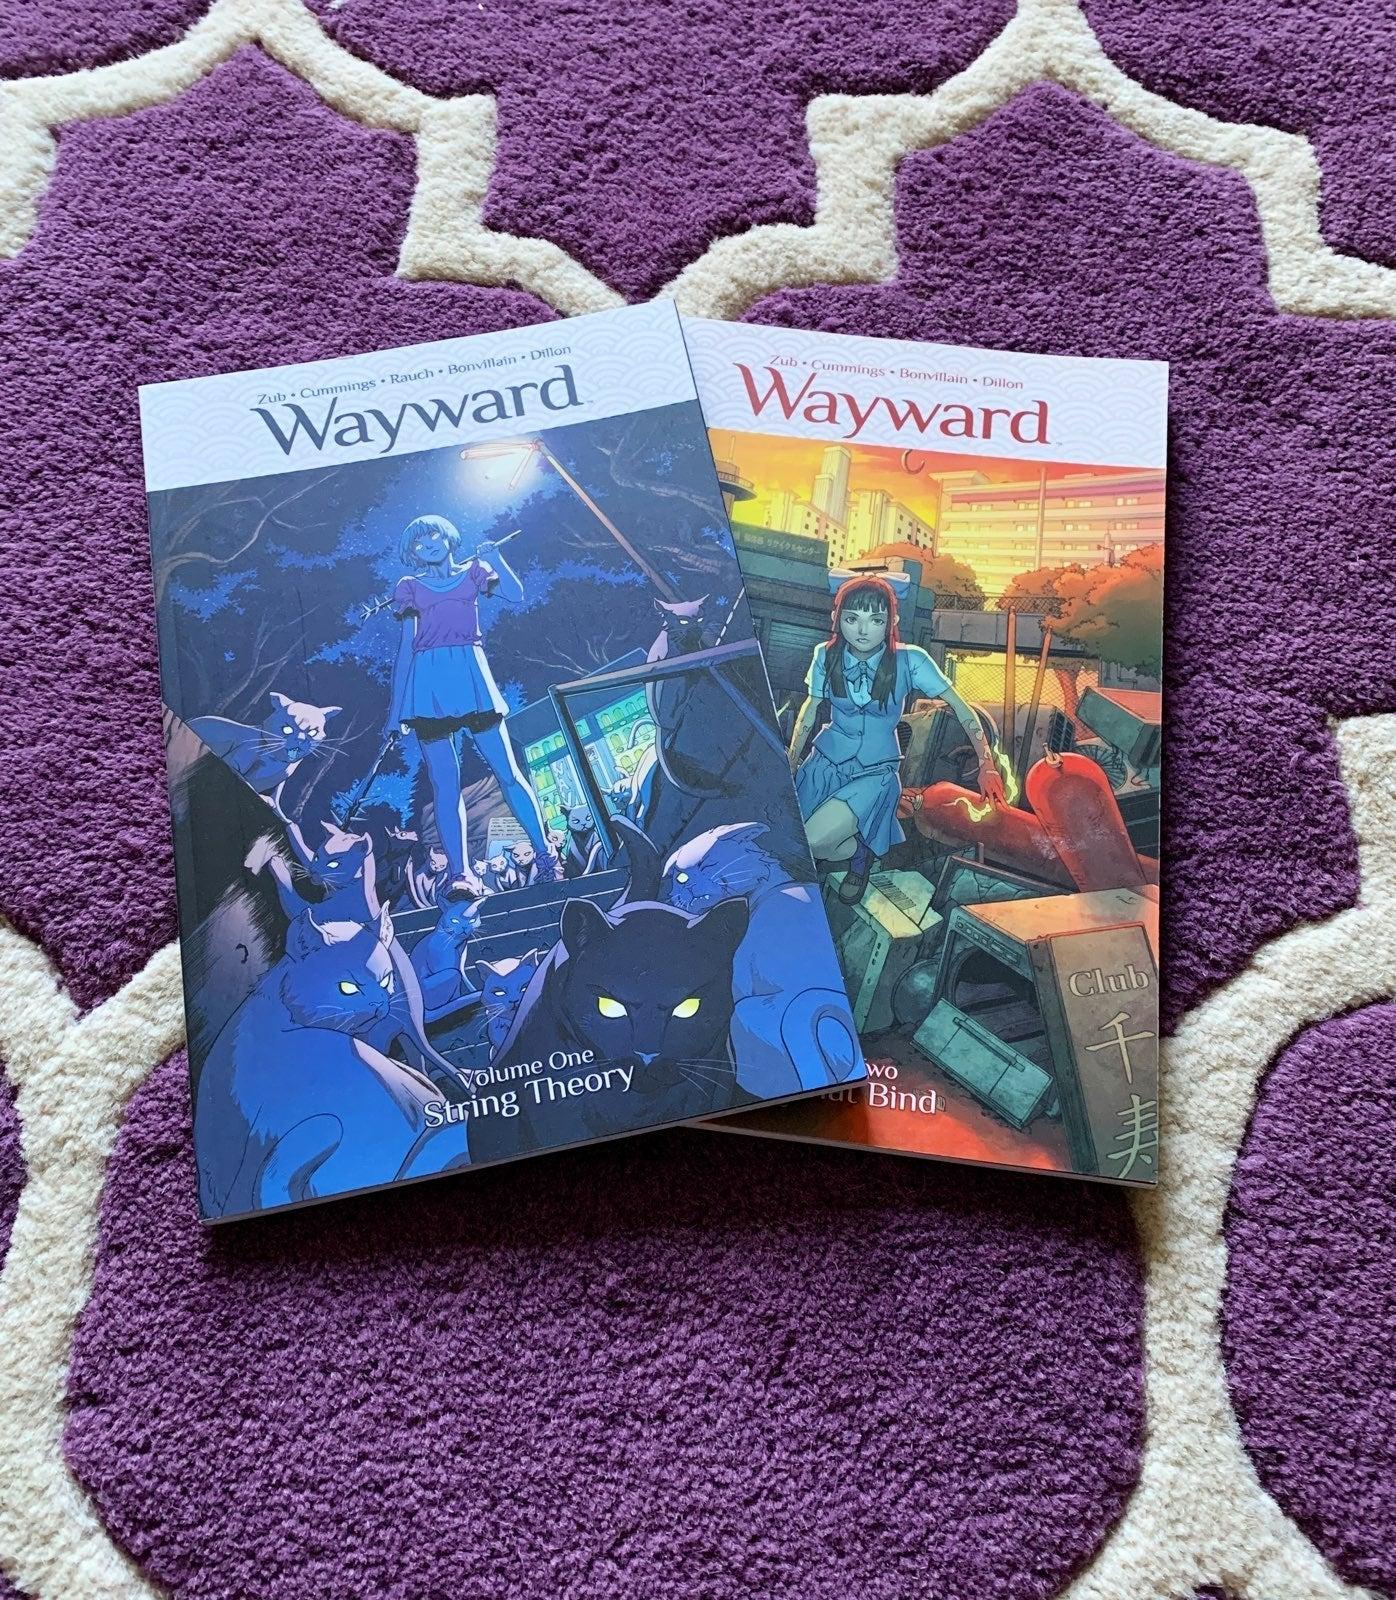 Image Comics - Wayward (Vol. 1 & 2)